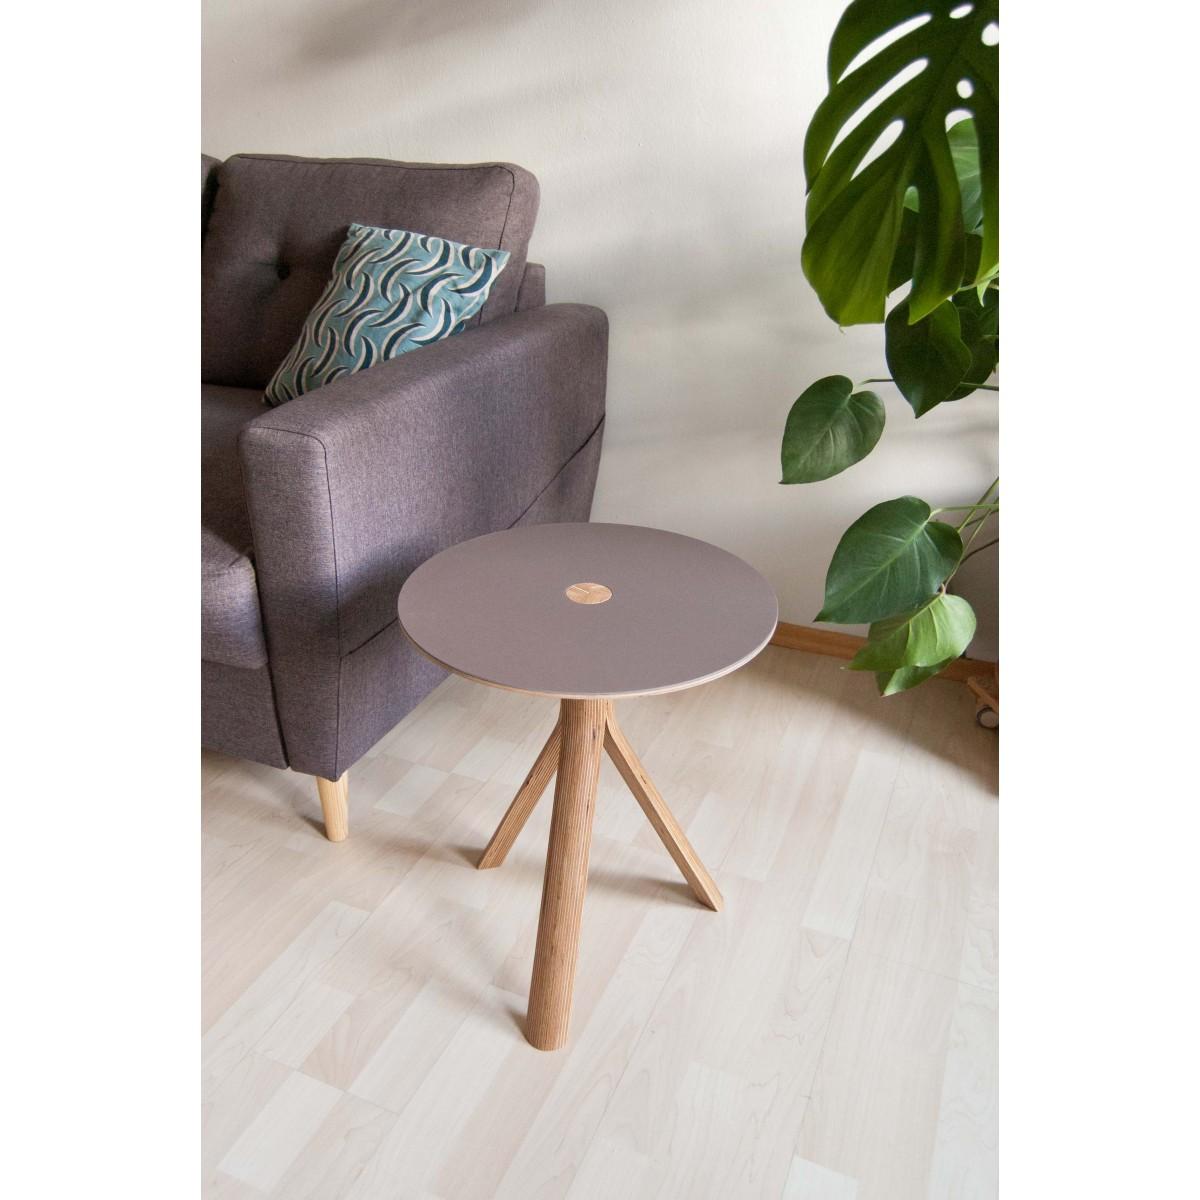 TUBE Möbeldesign Jonas Nitsch